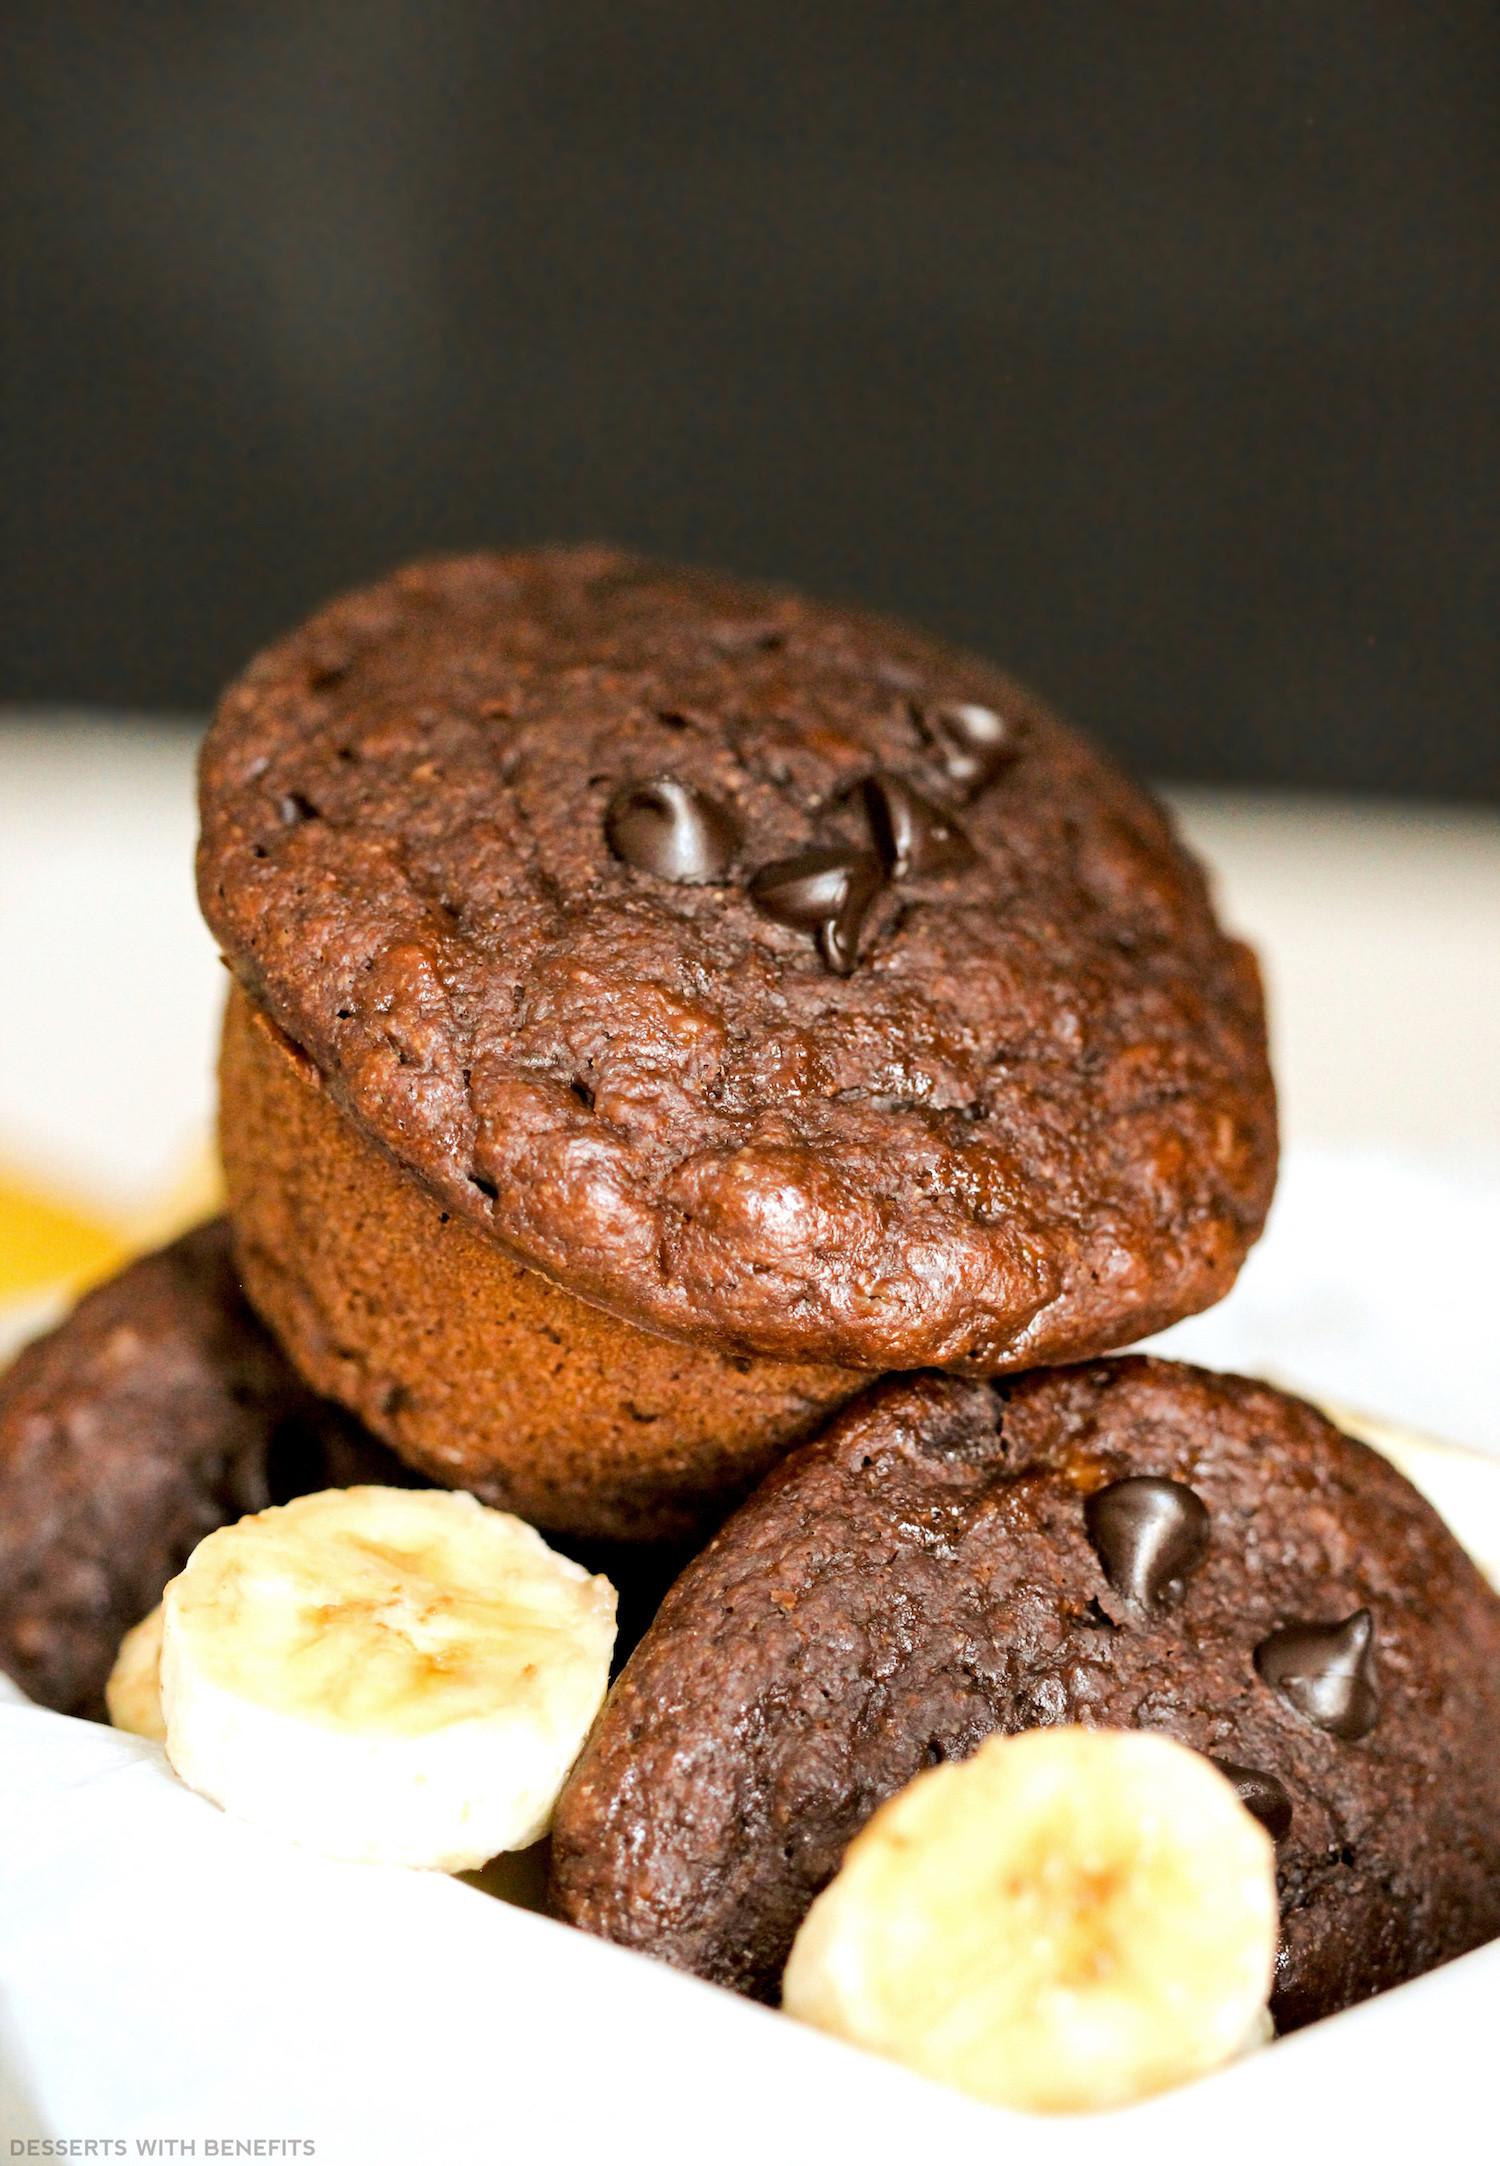 Healthy Chocolate Banana Muffins  Healthy Chocolate Banana Muffins refined sugar free low